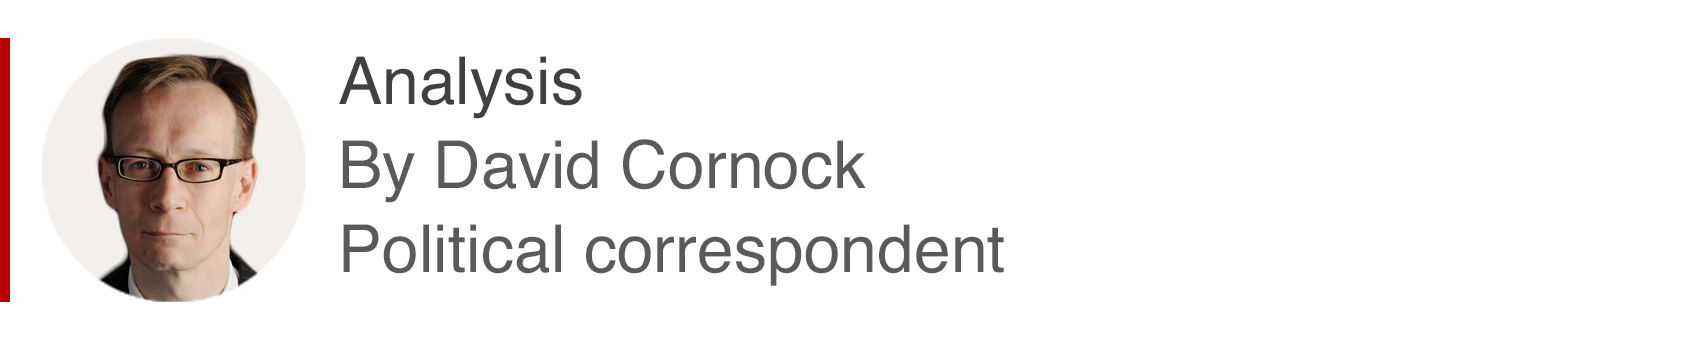 Analysis box by David Cornock, political correspondent